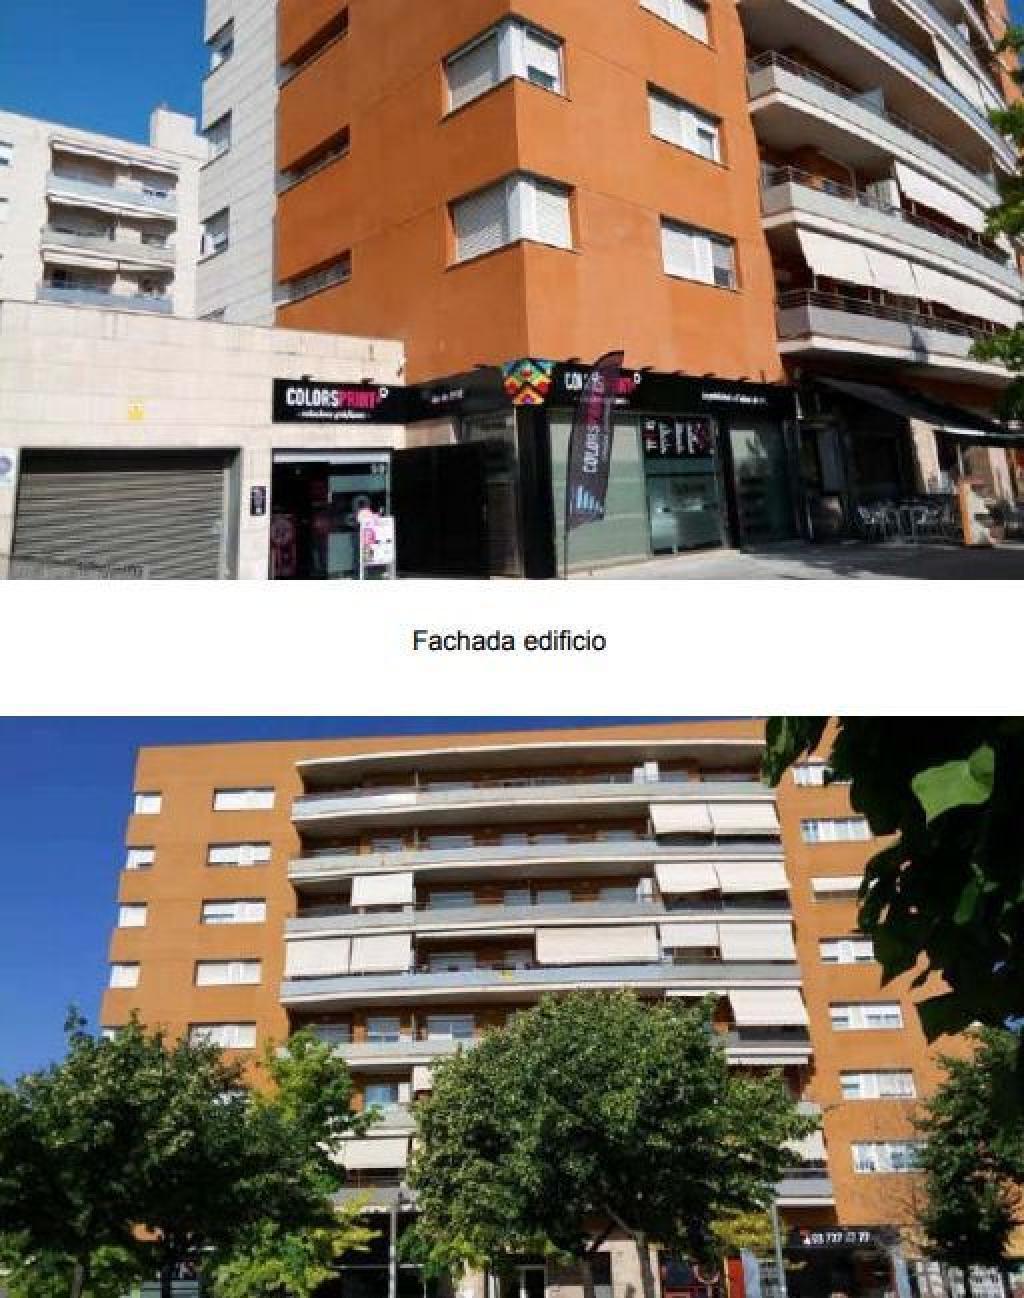 221359 - Calle Budapest - Sabadell